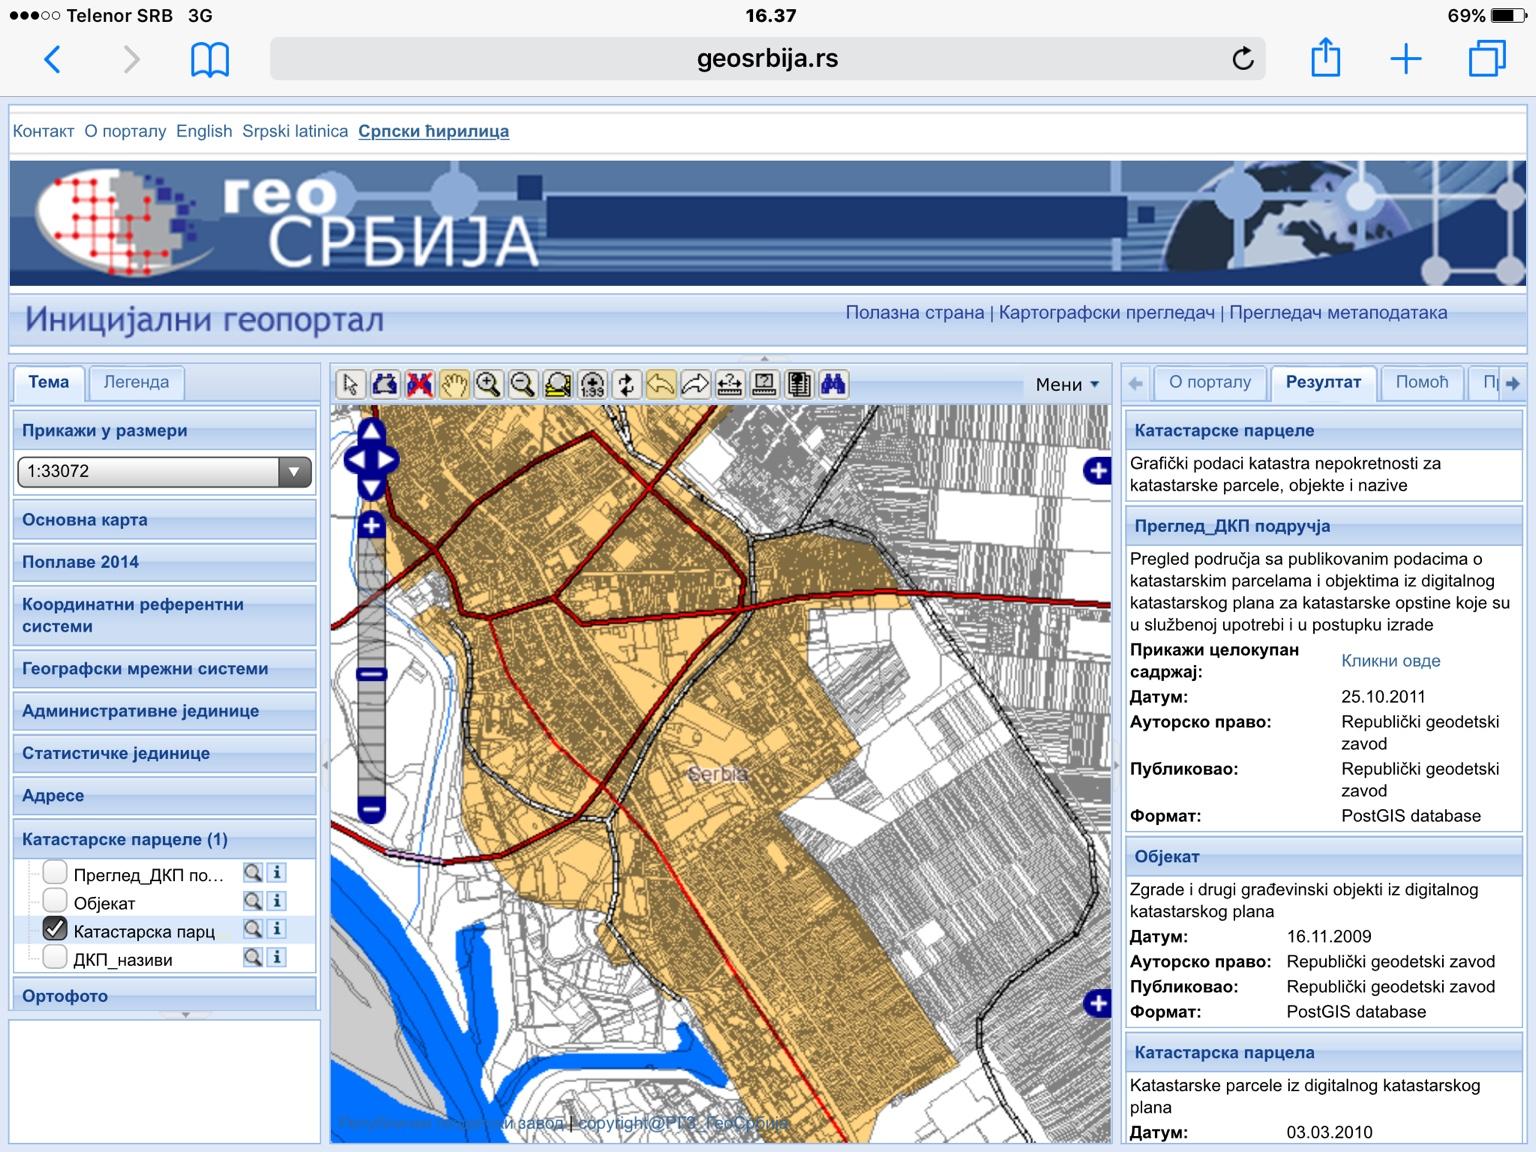 katastar srbija mapa Precizno merenje parcela uz pomoć sajta Katastra nepokretnosti i  katastar srbija mapa